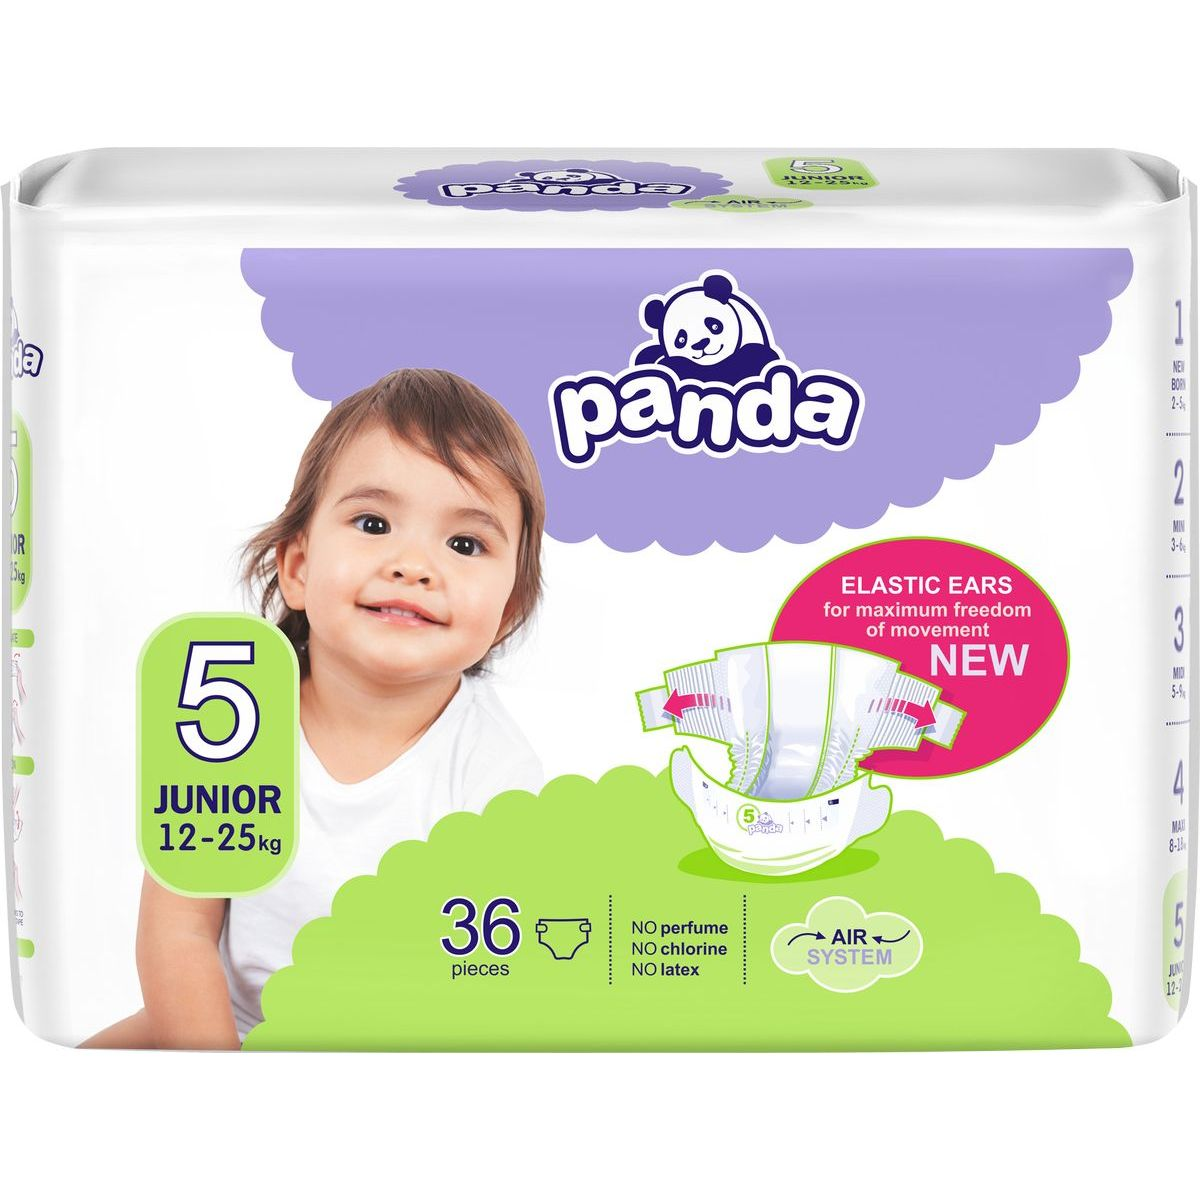 Panda 5 junior 12-25kg 36ks